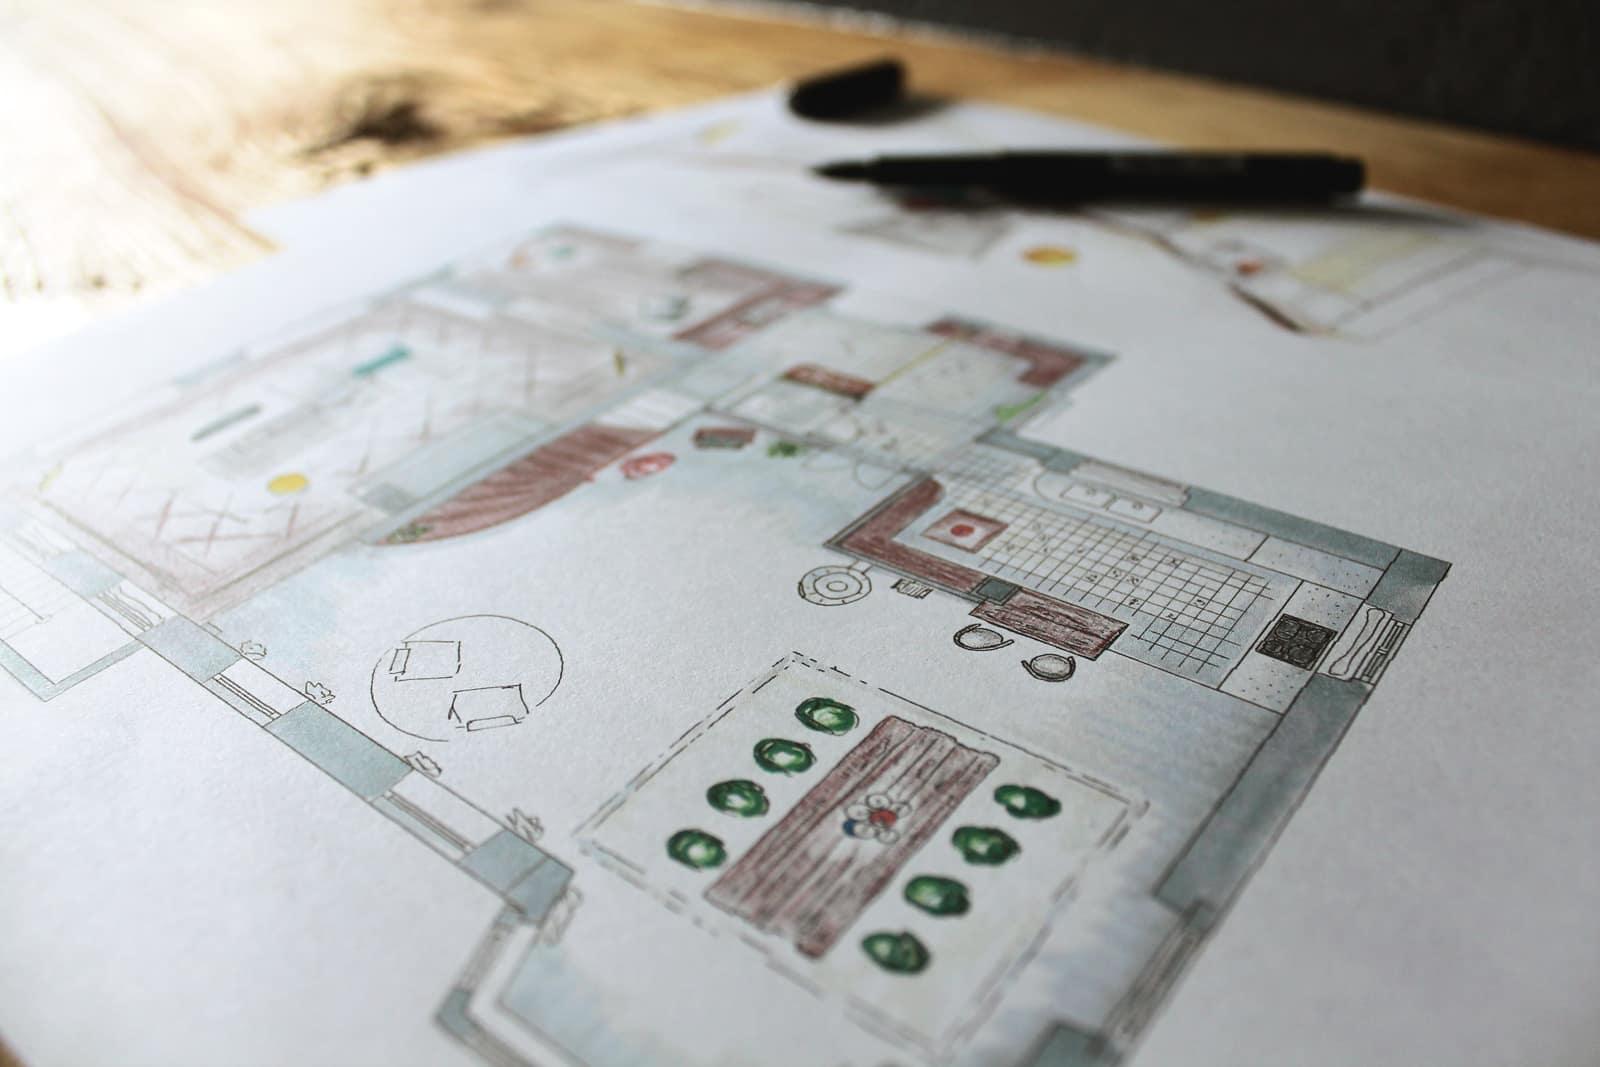 Vinval Interior Design Sketches